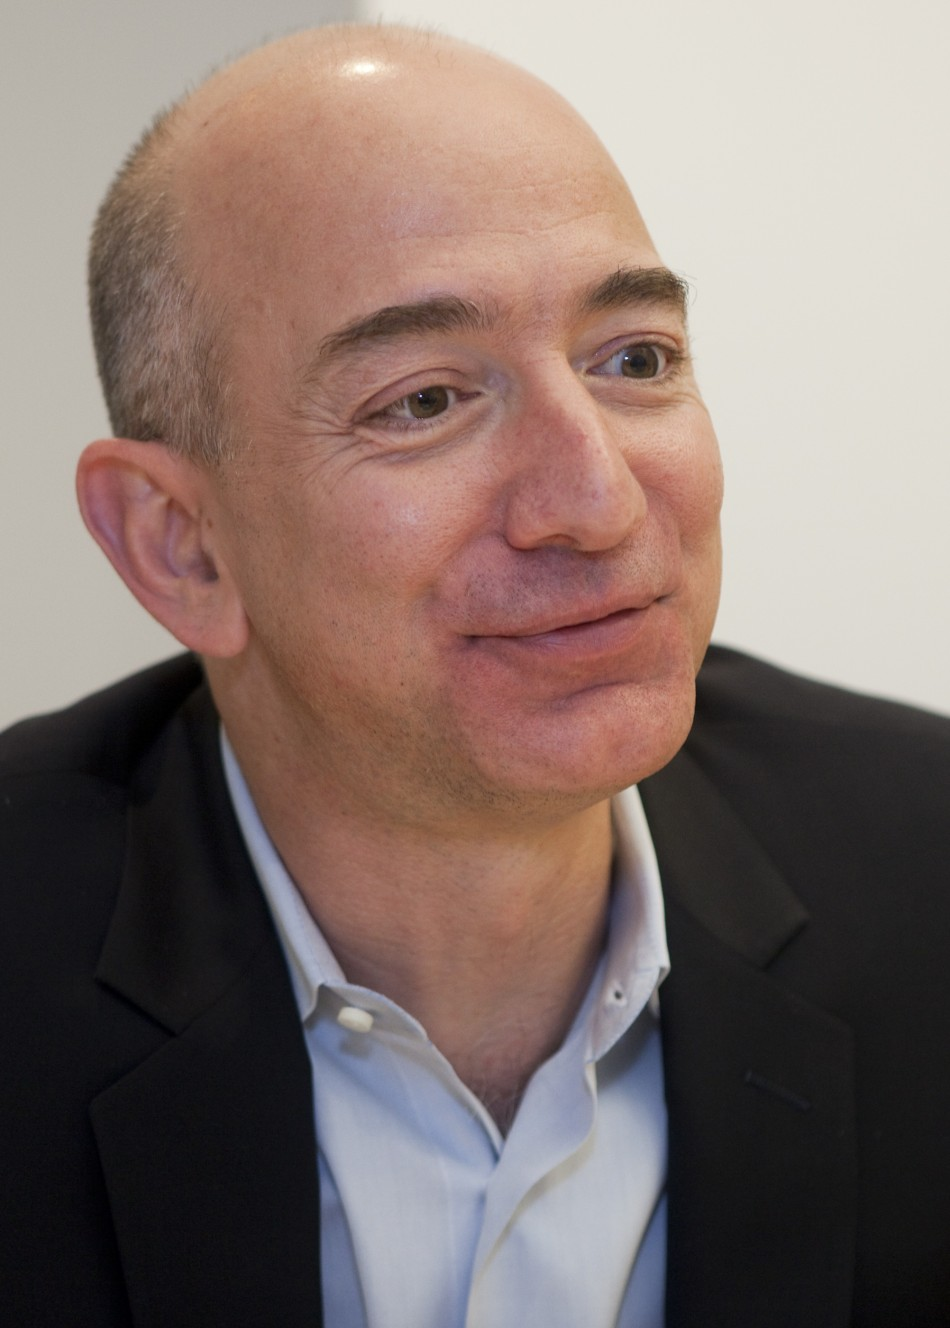 Amazon Founder, CEO Jeff Bezos